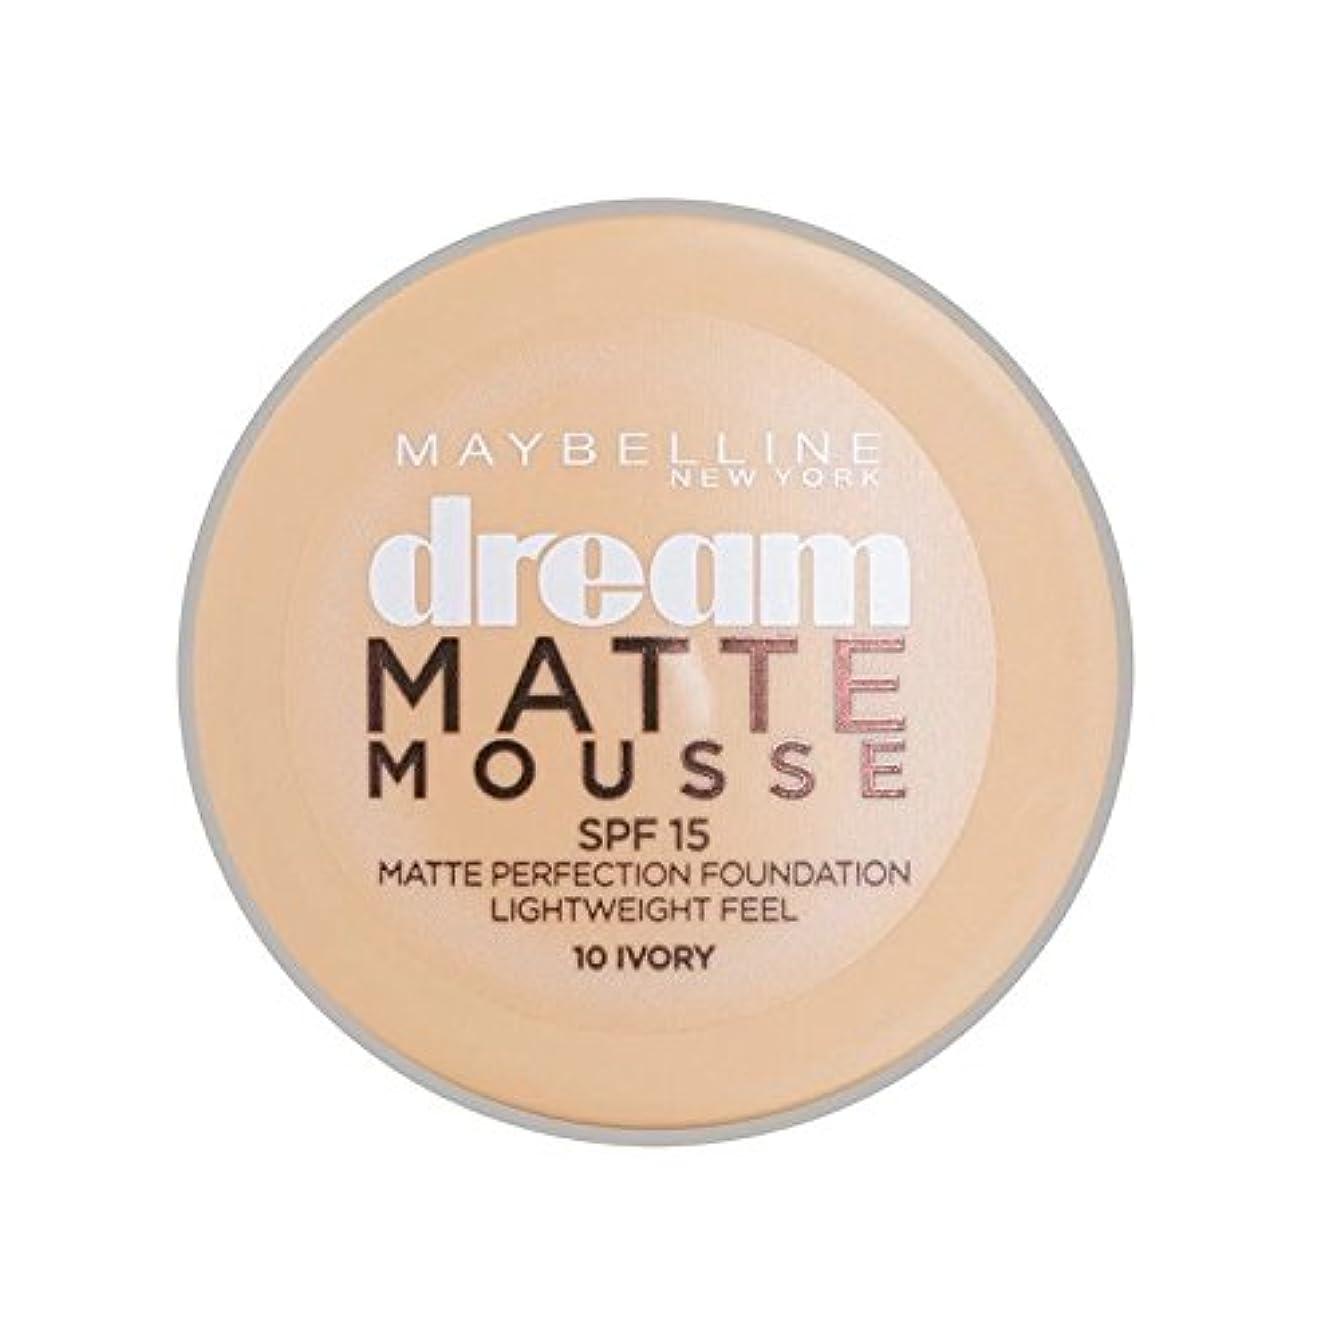 Maybelline Dream Matte Mousse Foundation 10 Ivory 10ml (Pack of 6) - メイベリン夢マットムース土台10アイボリー10ミリリットル x6 [並行輸入品]